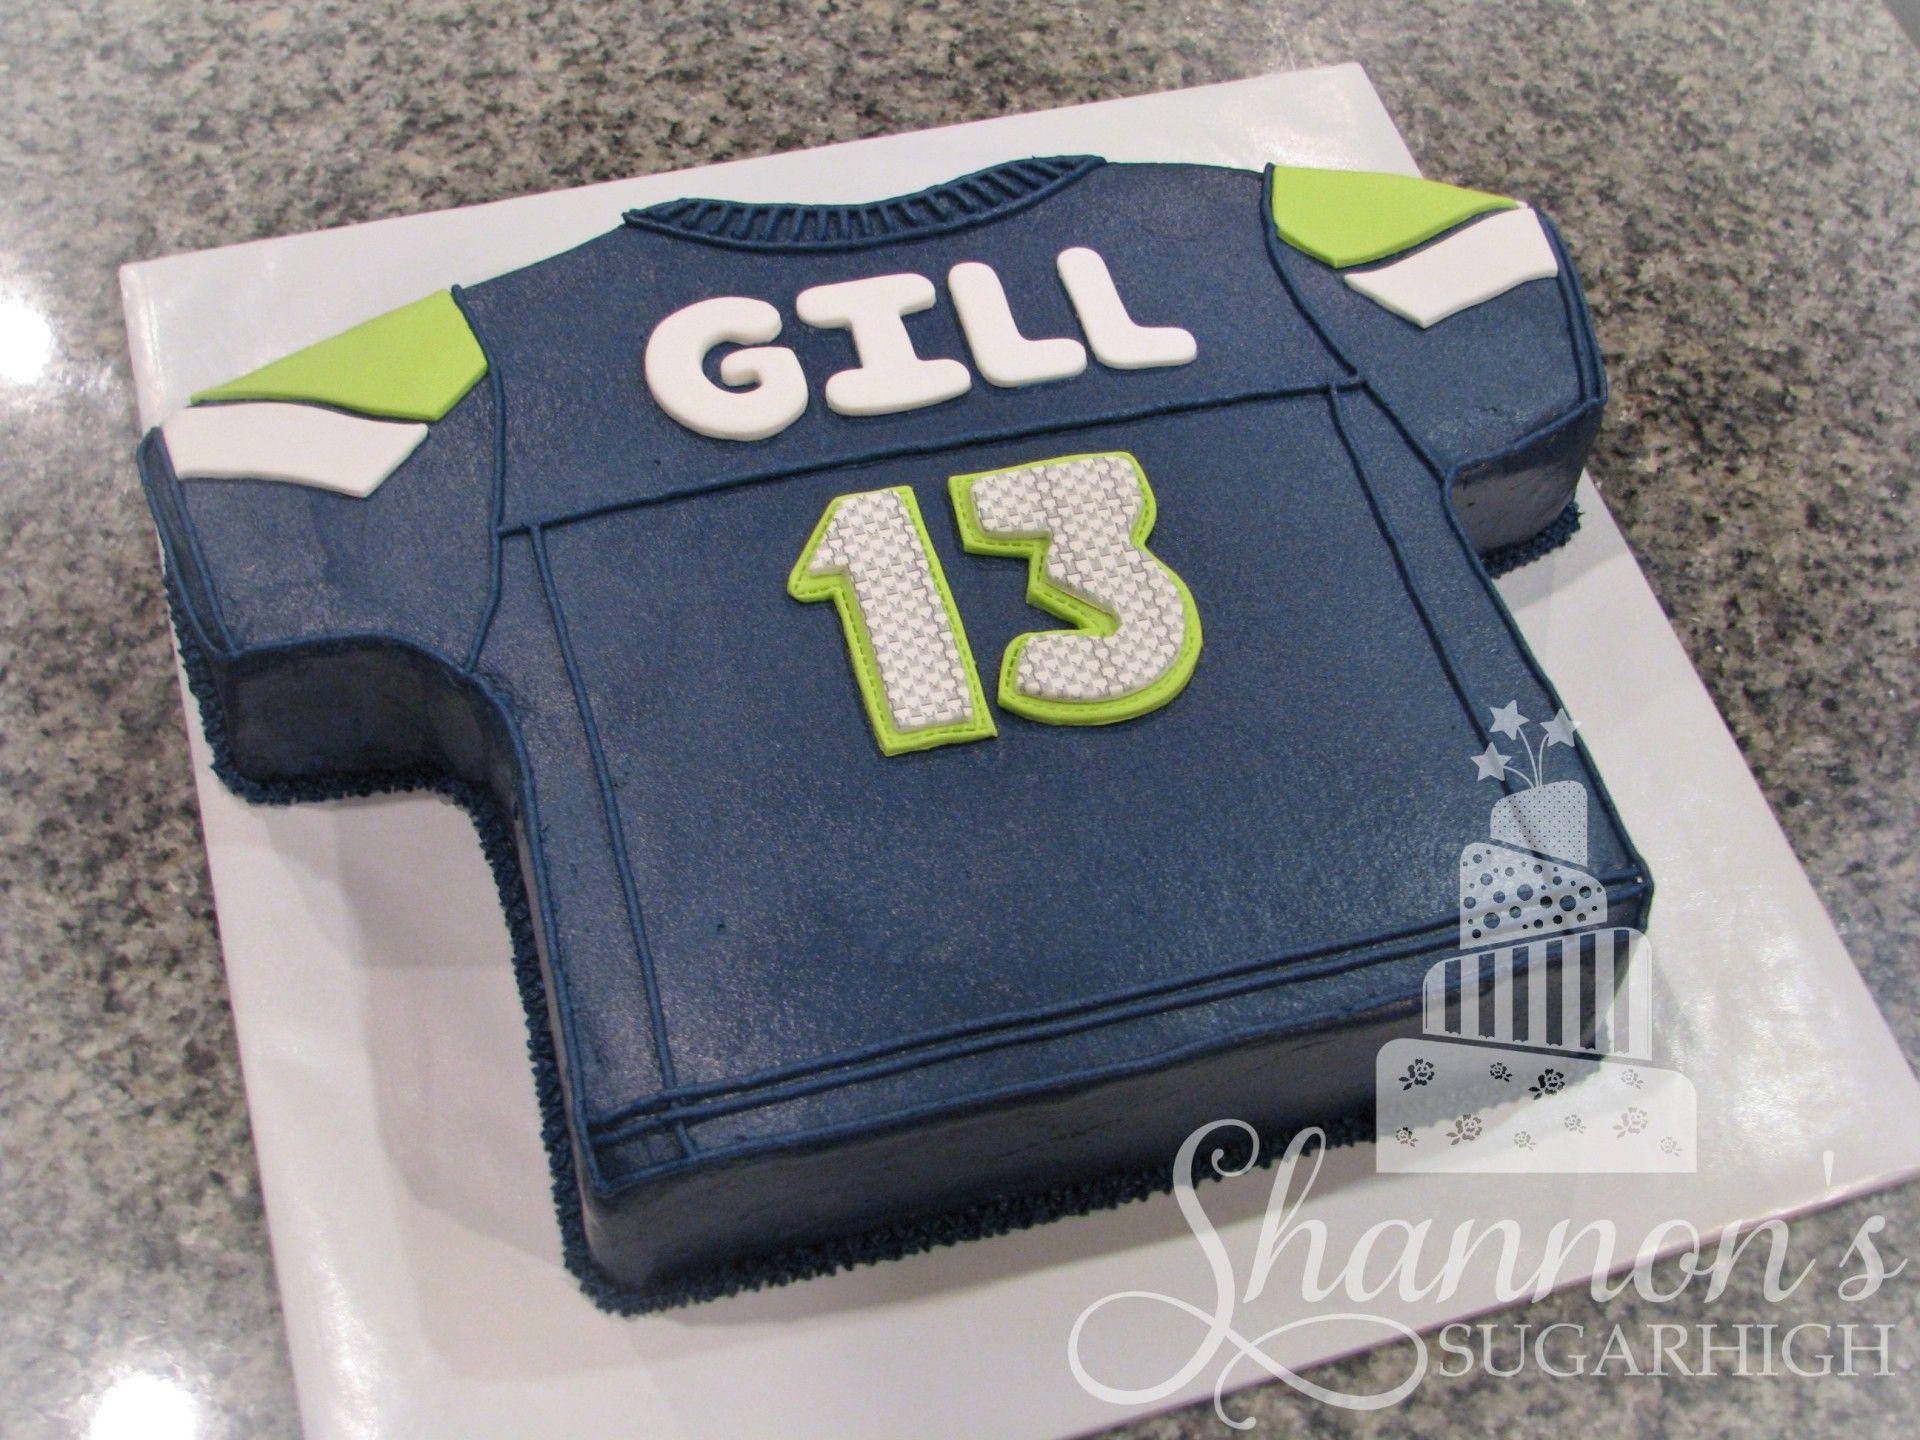 Celebration Cakes Boy Birthday Cake Celebration Cakes Football Birthday Party